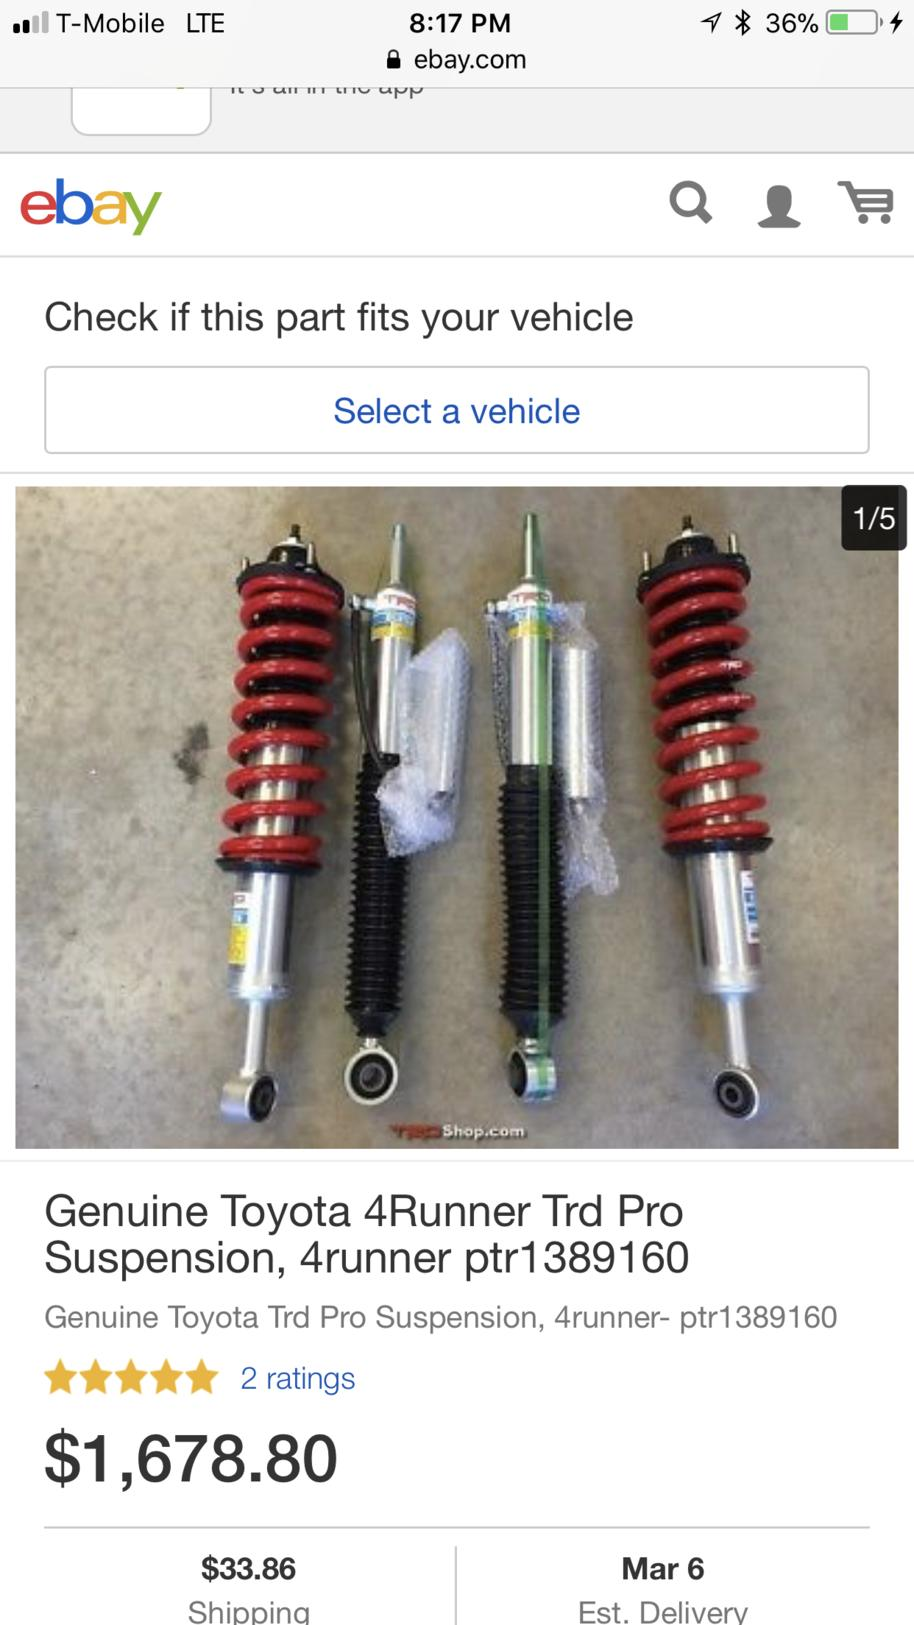 2017 Toyota 4Runner Trd Pro For Sale >> Bilstein TRD Pro suspension kit on sale PTR13-35140 - Page 8 - Toyota 4Runner Forum - Largest ...